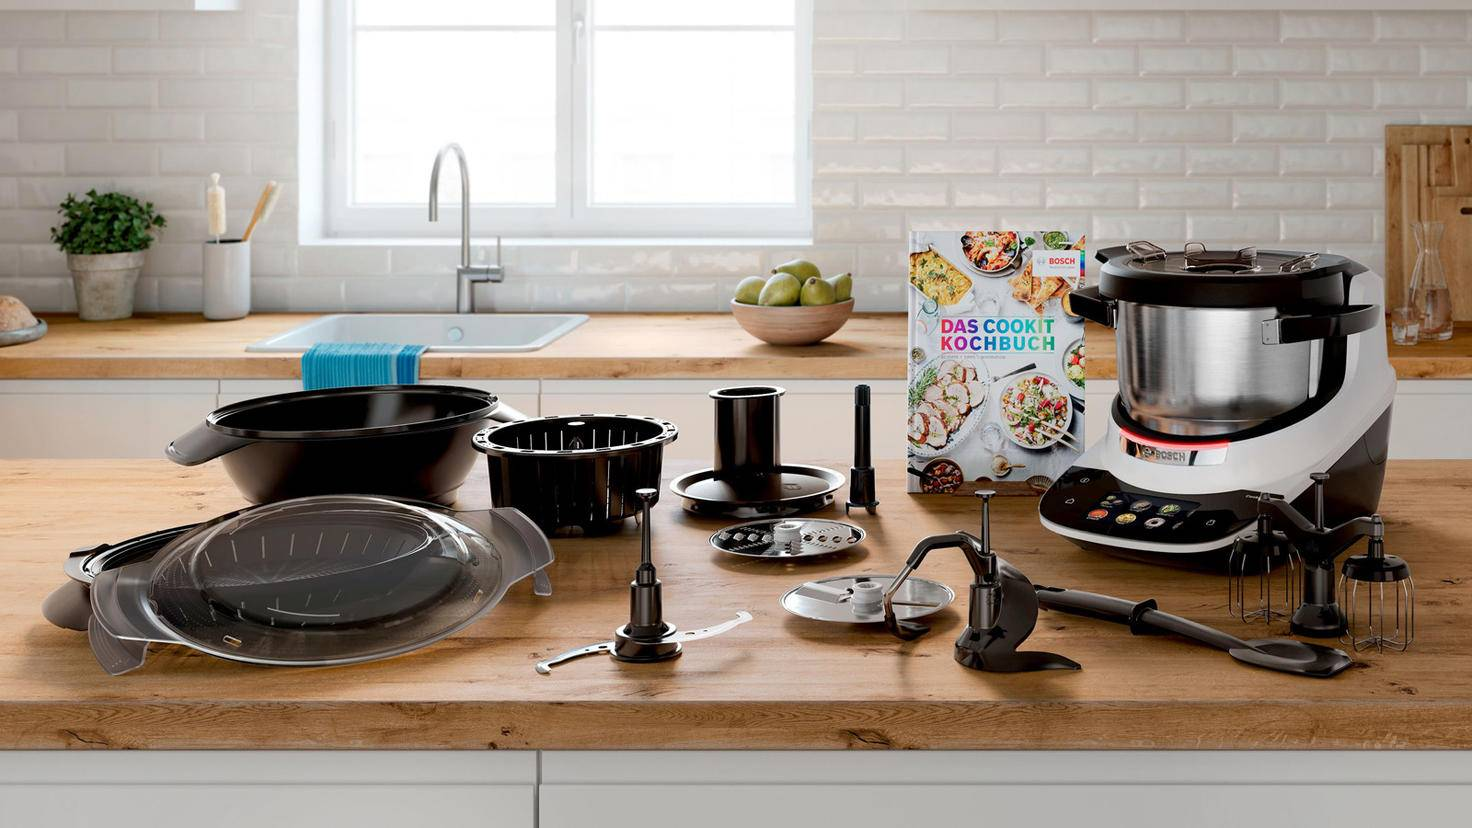 Bosch Cookit Preis